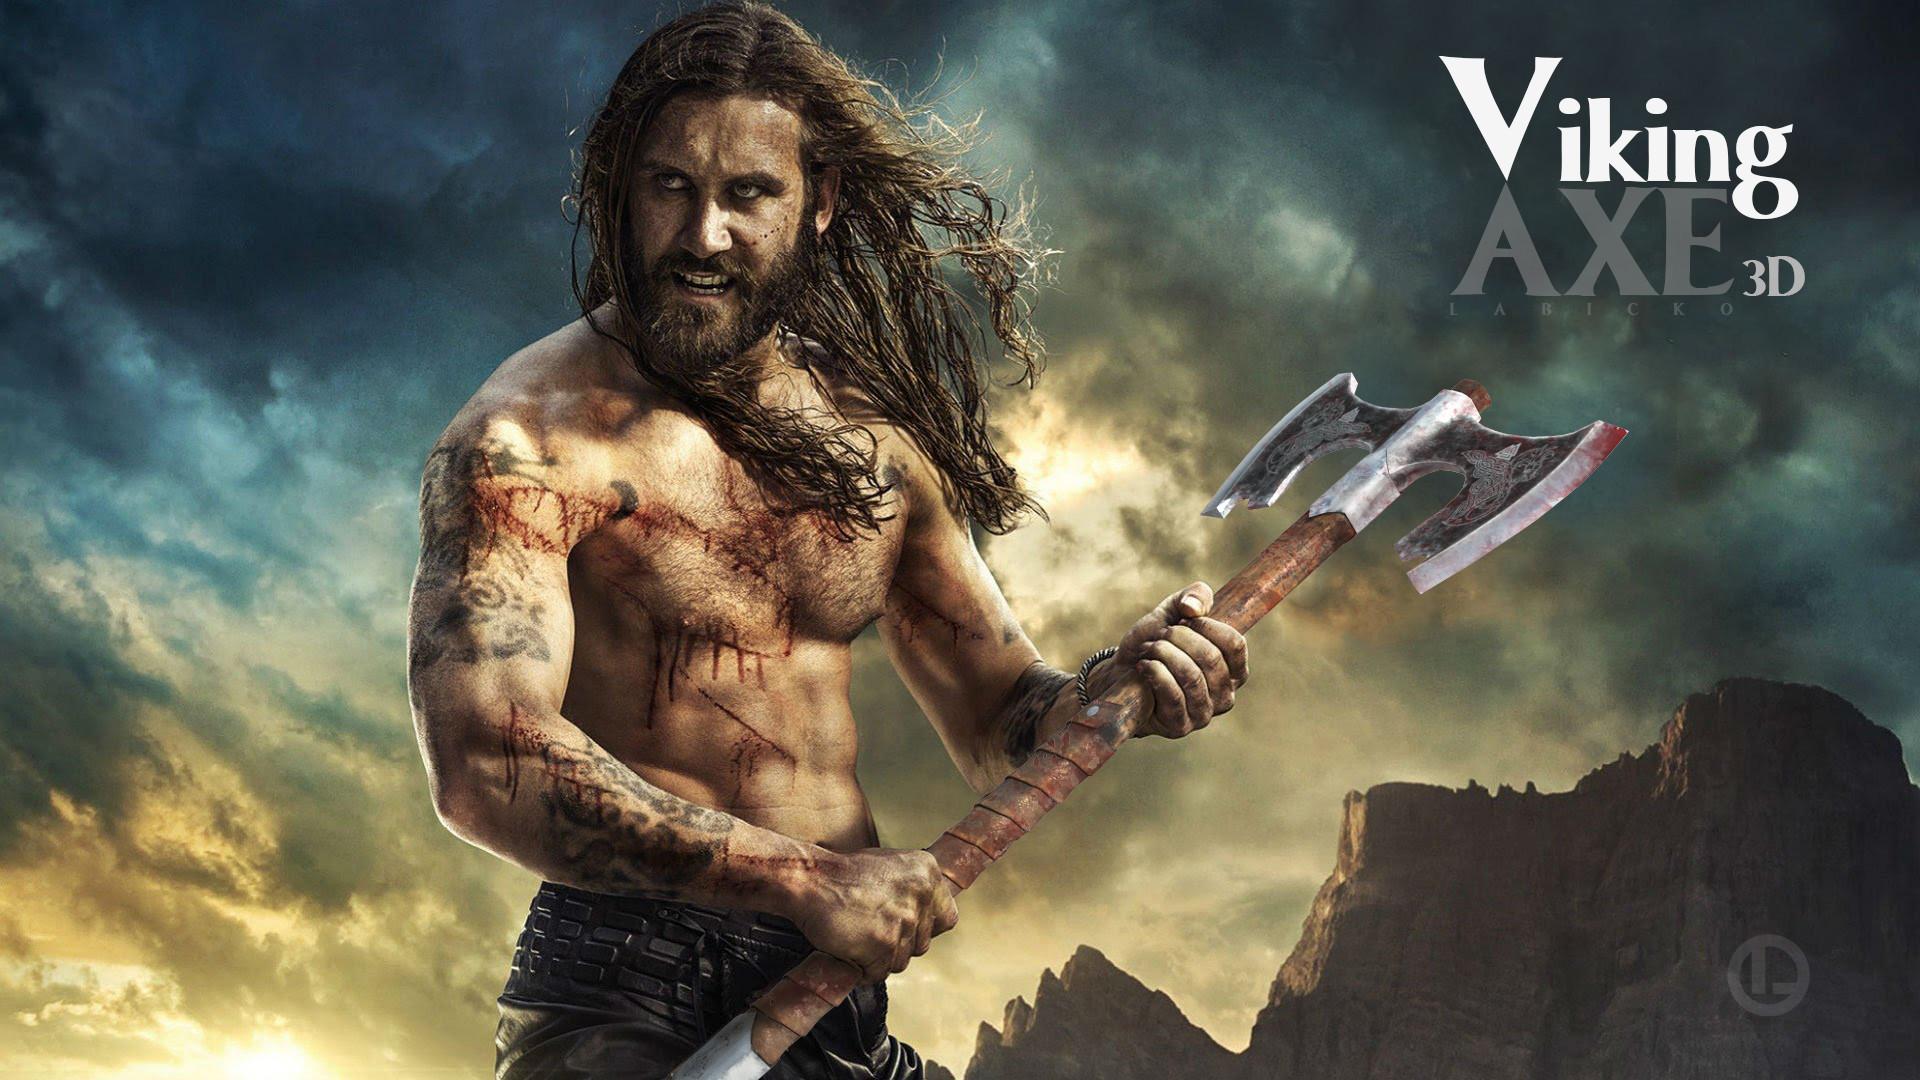 dejan-labicic-3d-viking-axe-1.jpg